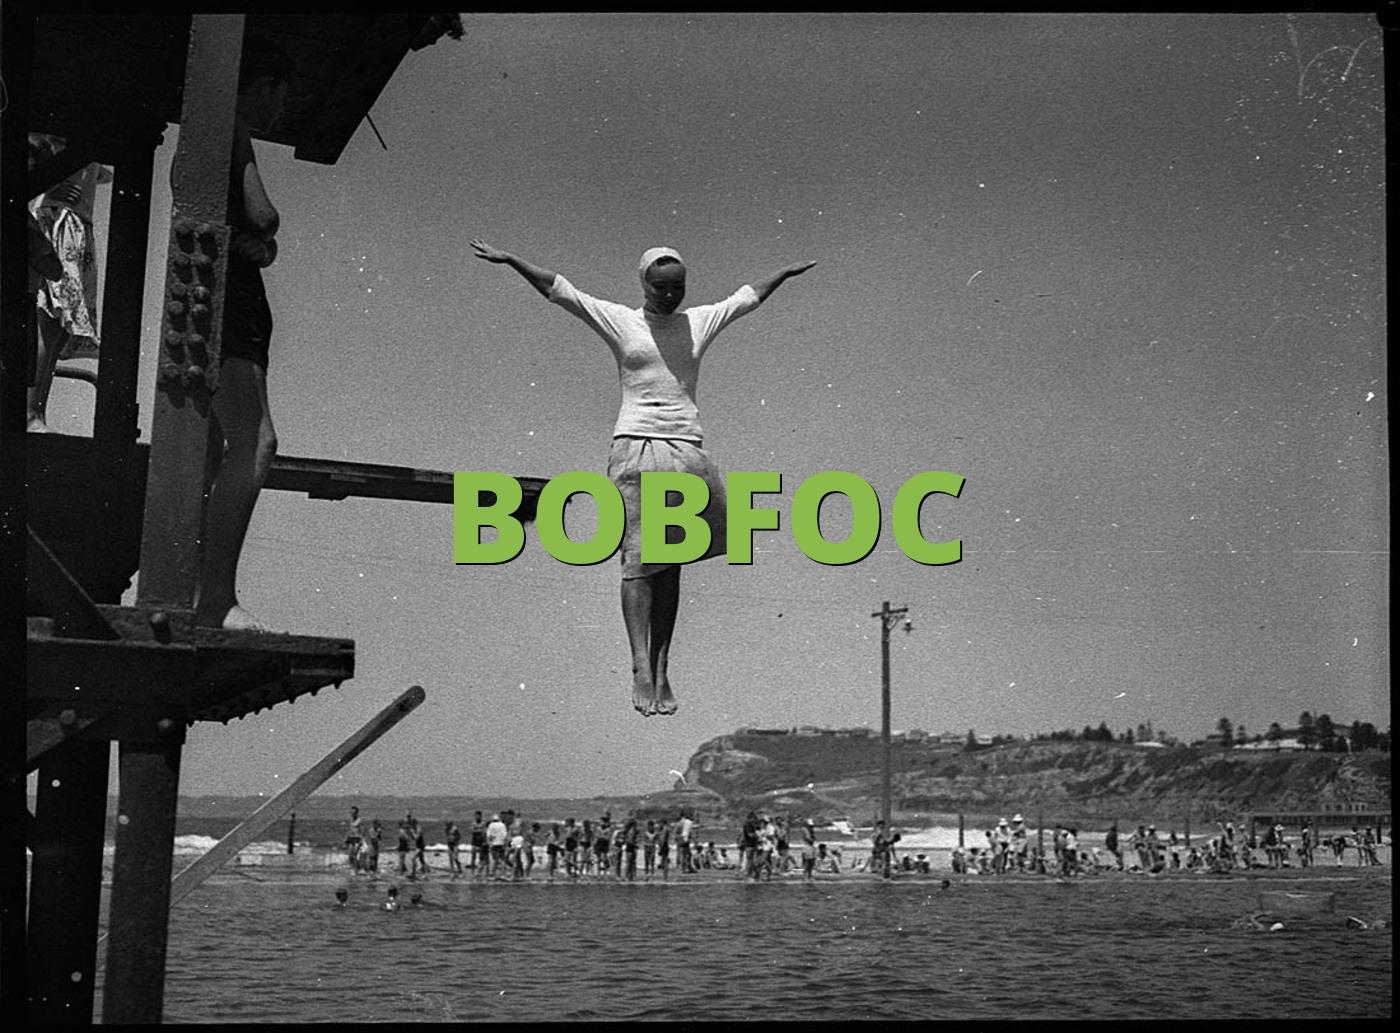 BOBFOC